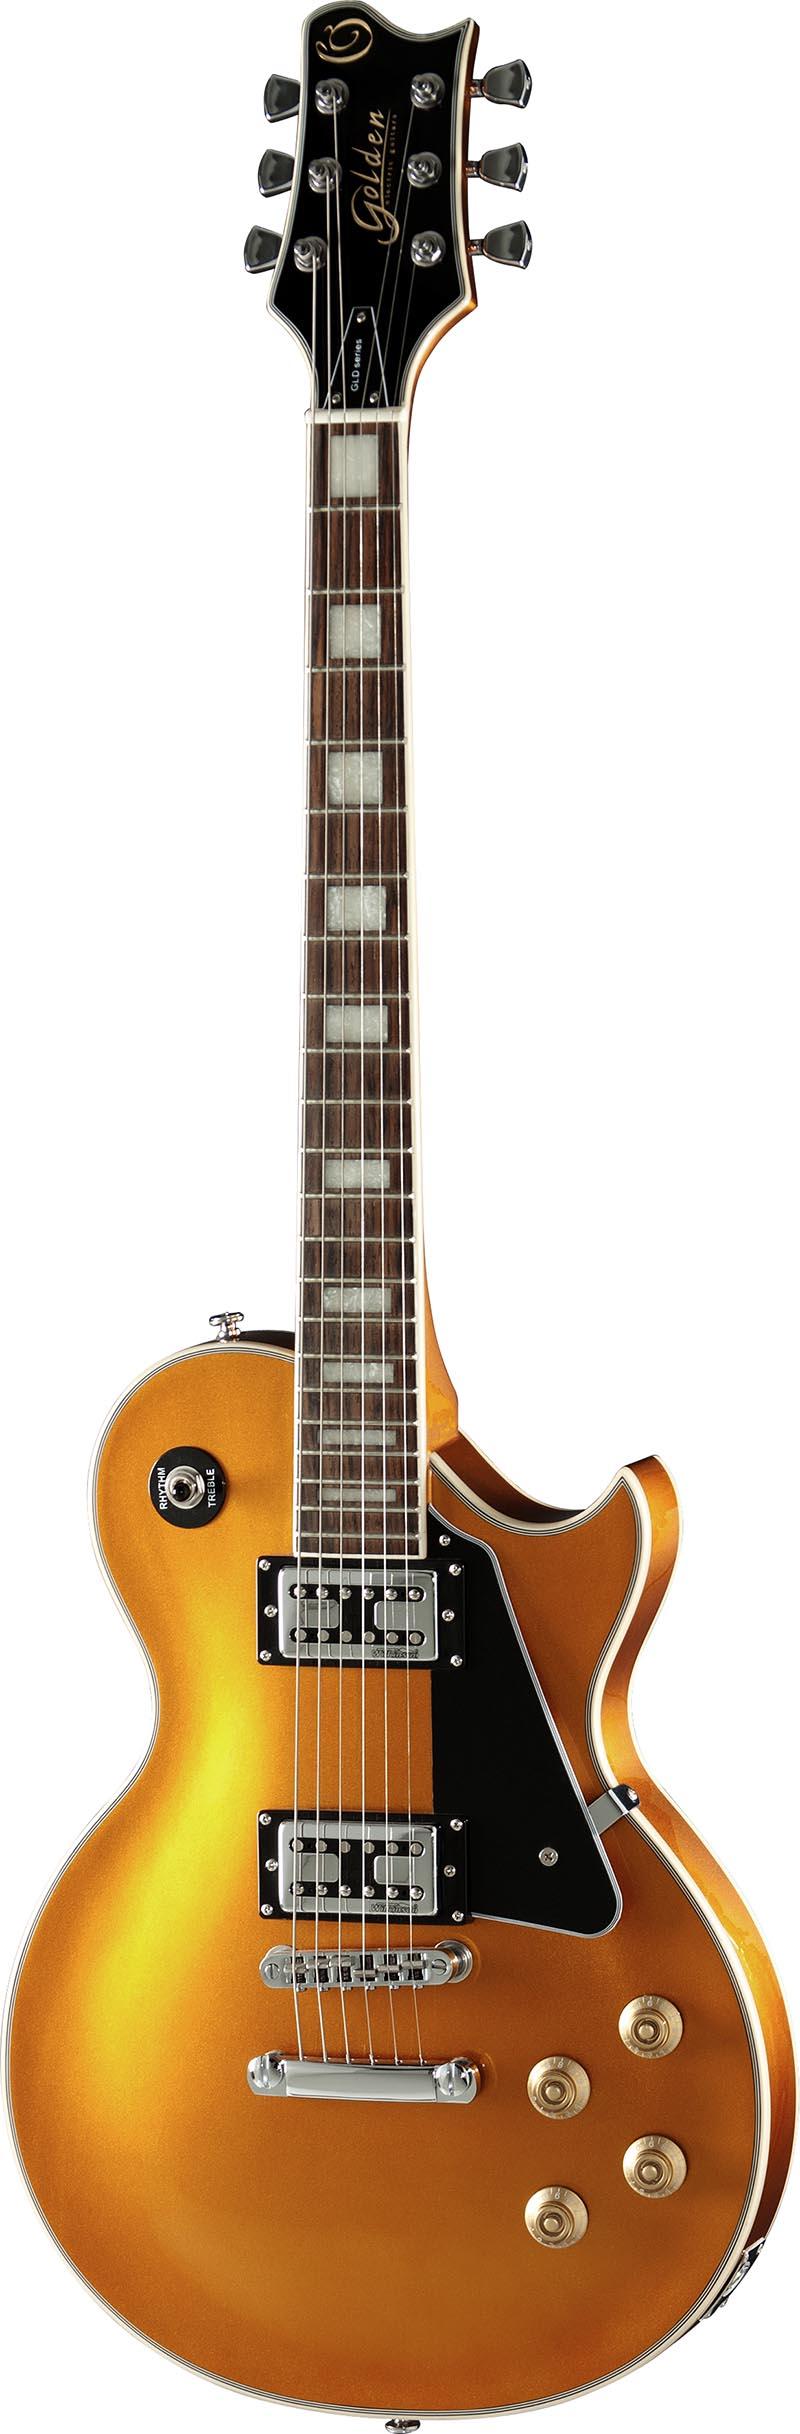 gld152c guitarra eletrica les paul golden gld152c gld goldtop dourada visao frontal vertical